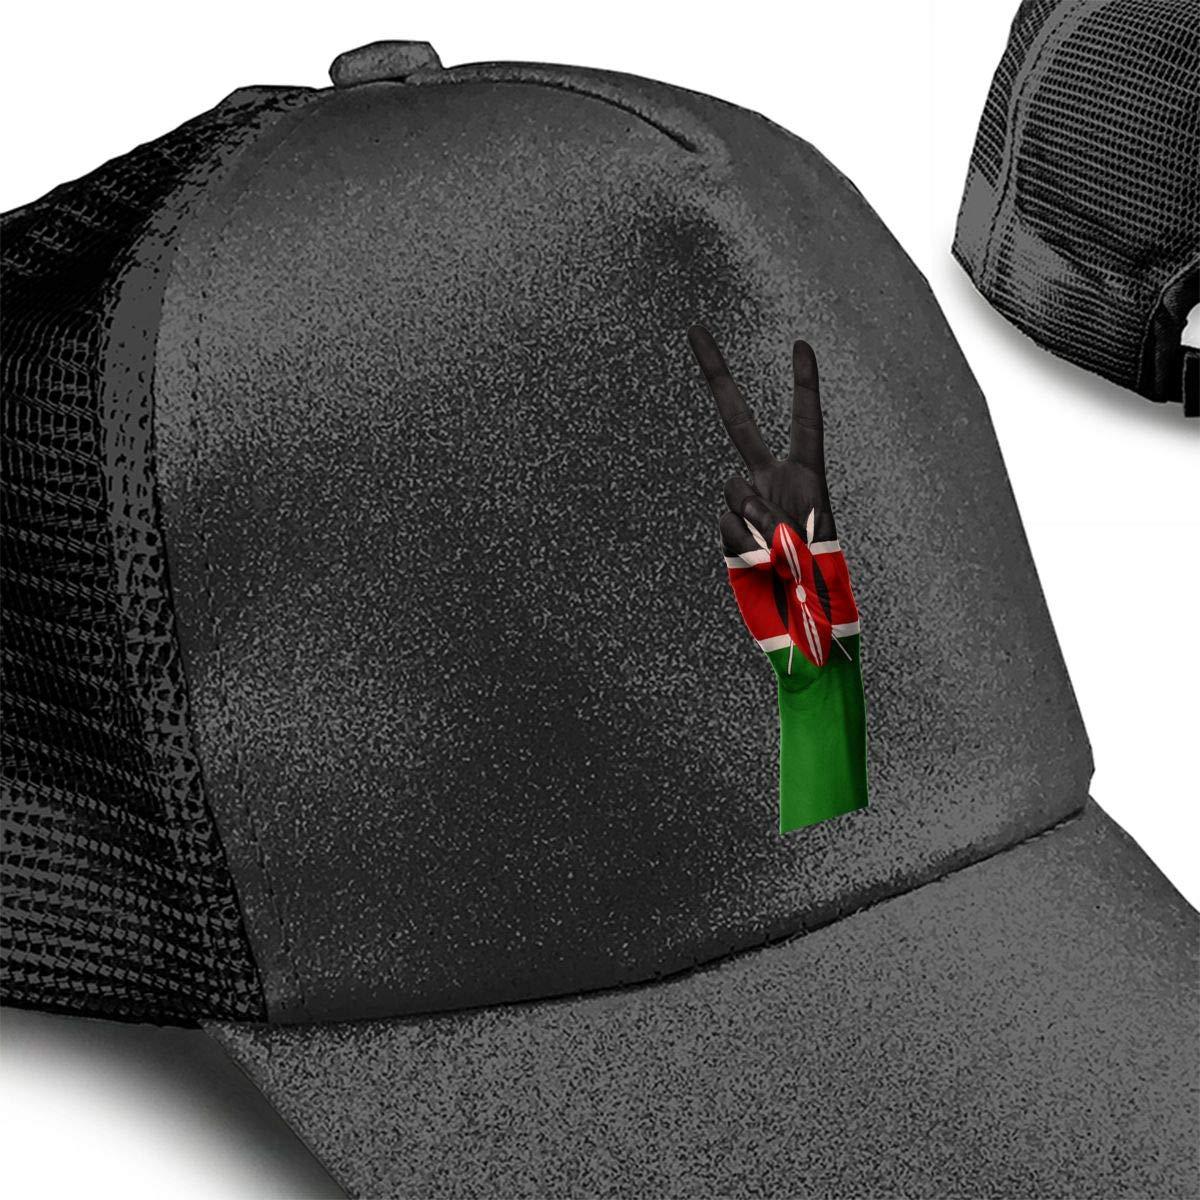 Kenya Ponytail Messy High Bun Hat Ponycaps Baseball Cap Adjustable Trucker Cap Mesh Cap